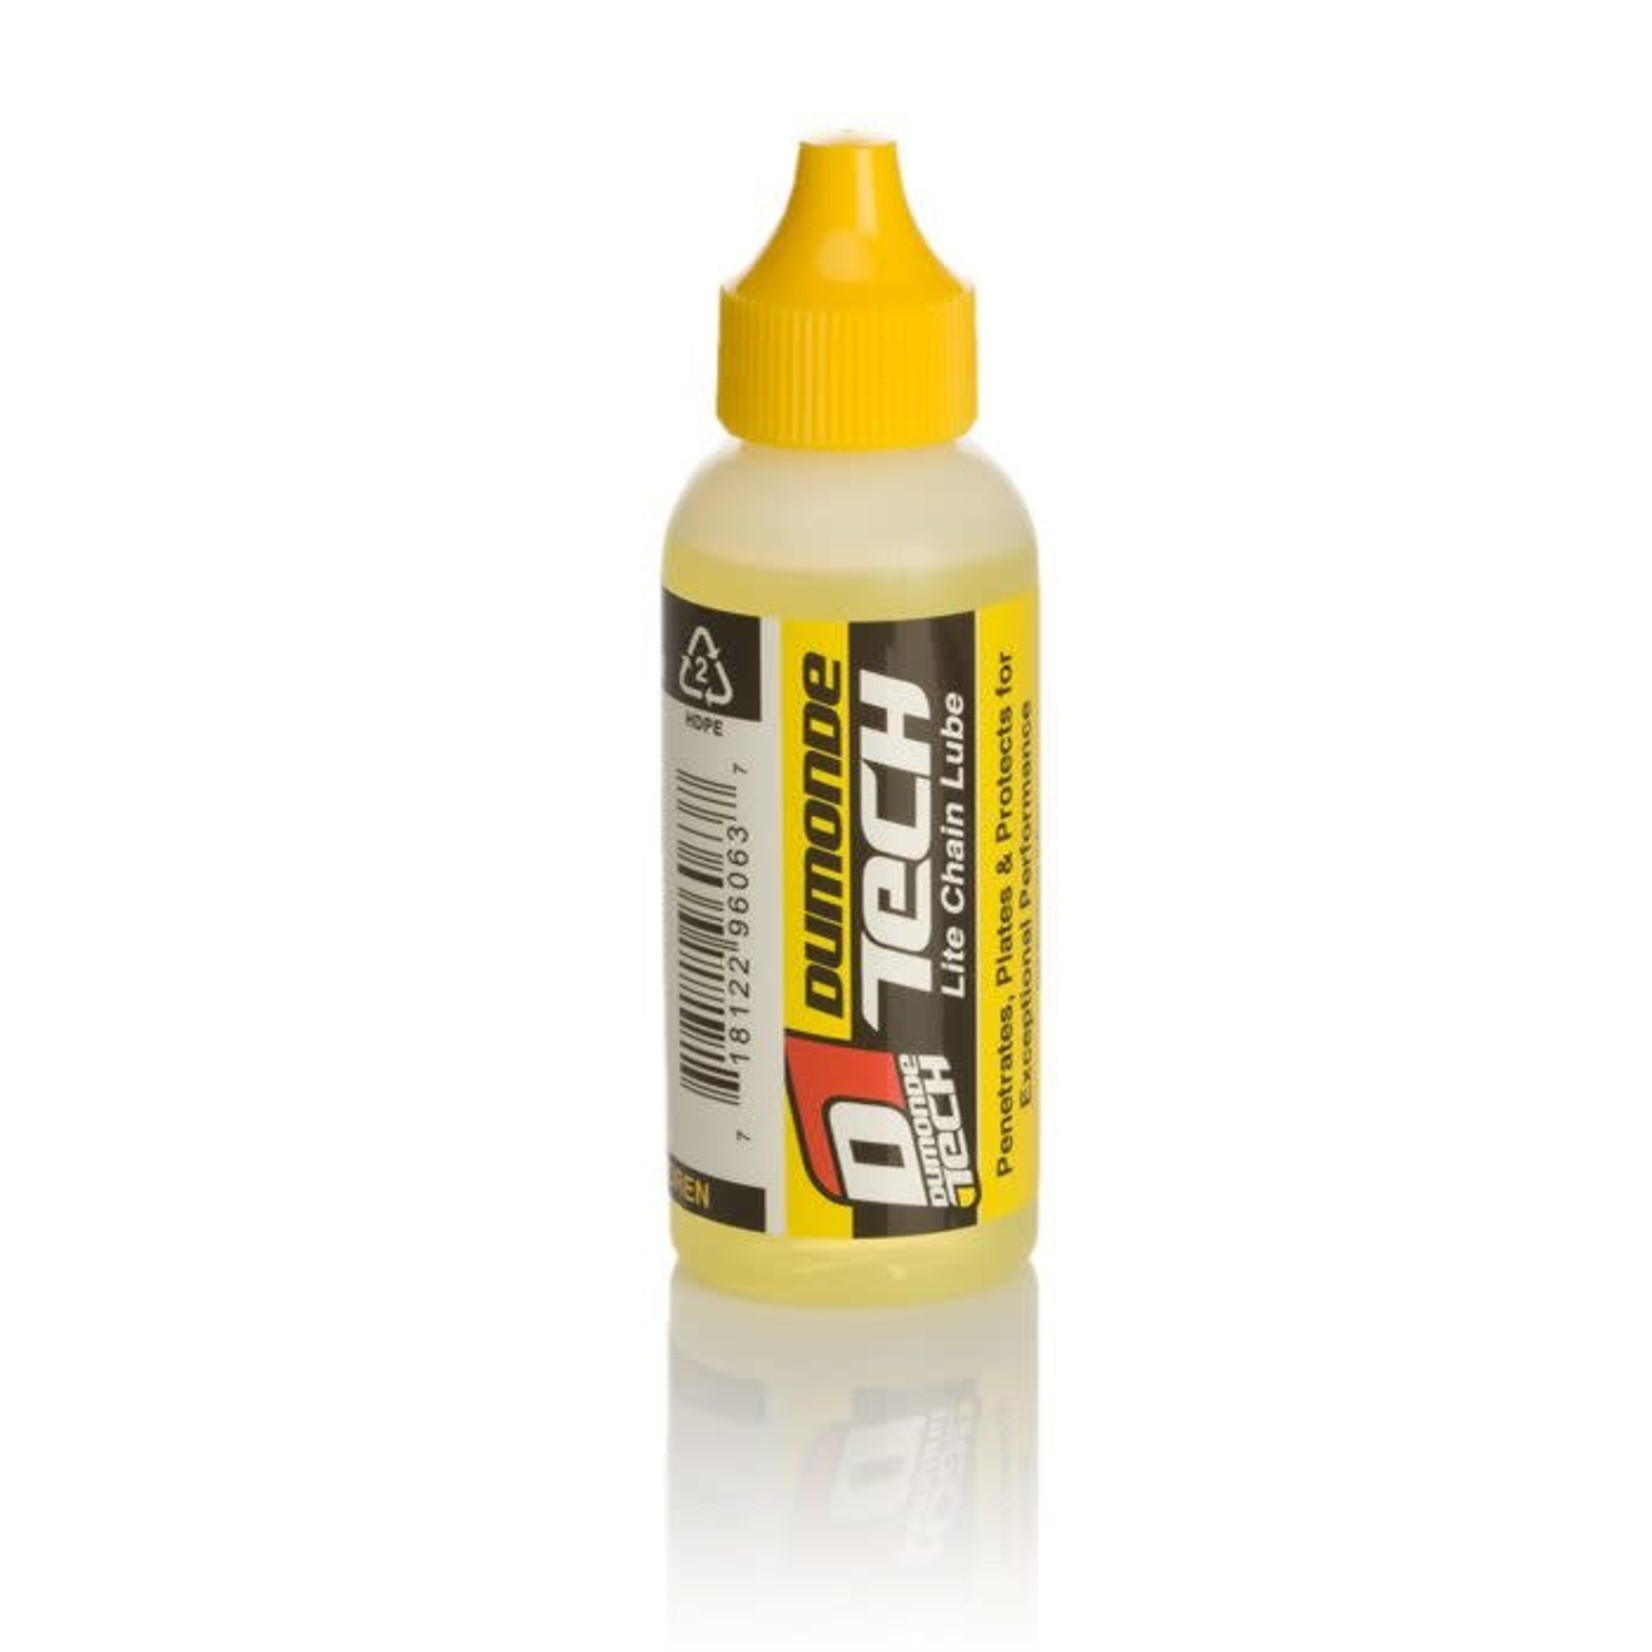 Dumonde Tech Dumonde Tech - Lite Formula BCL - 2oz